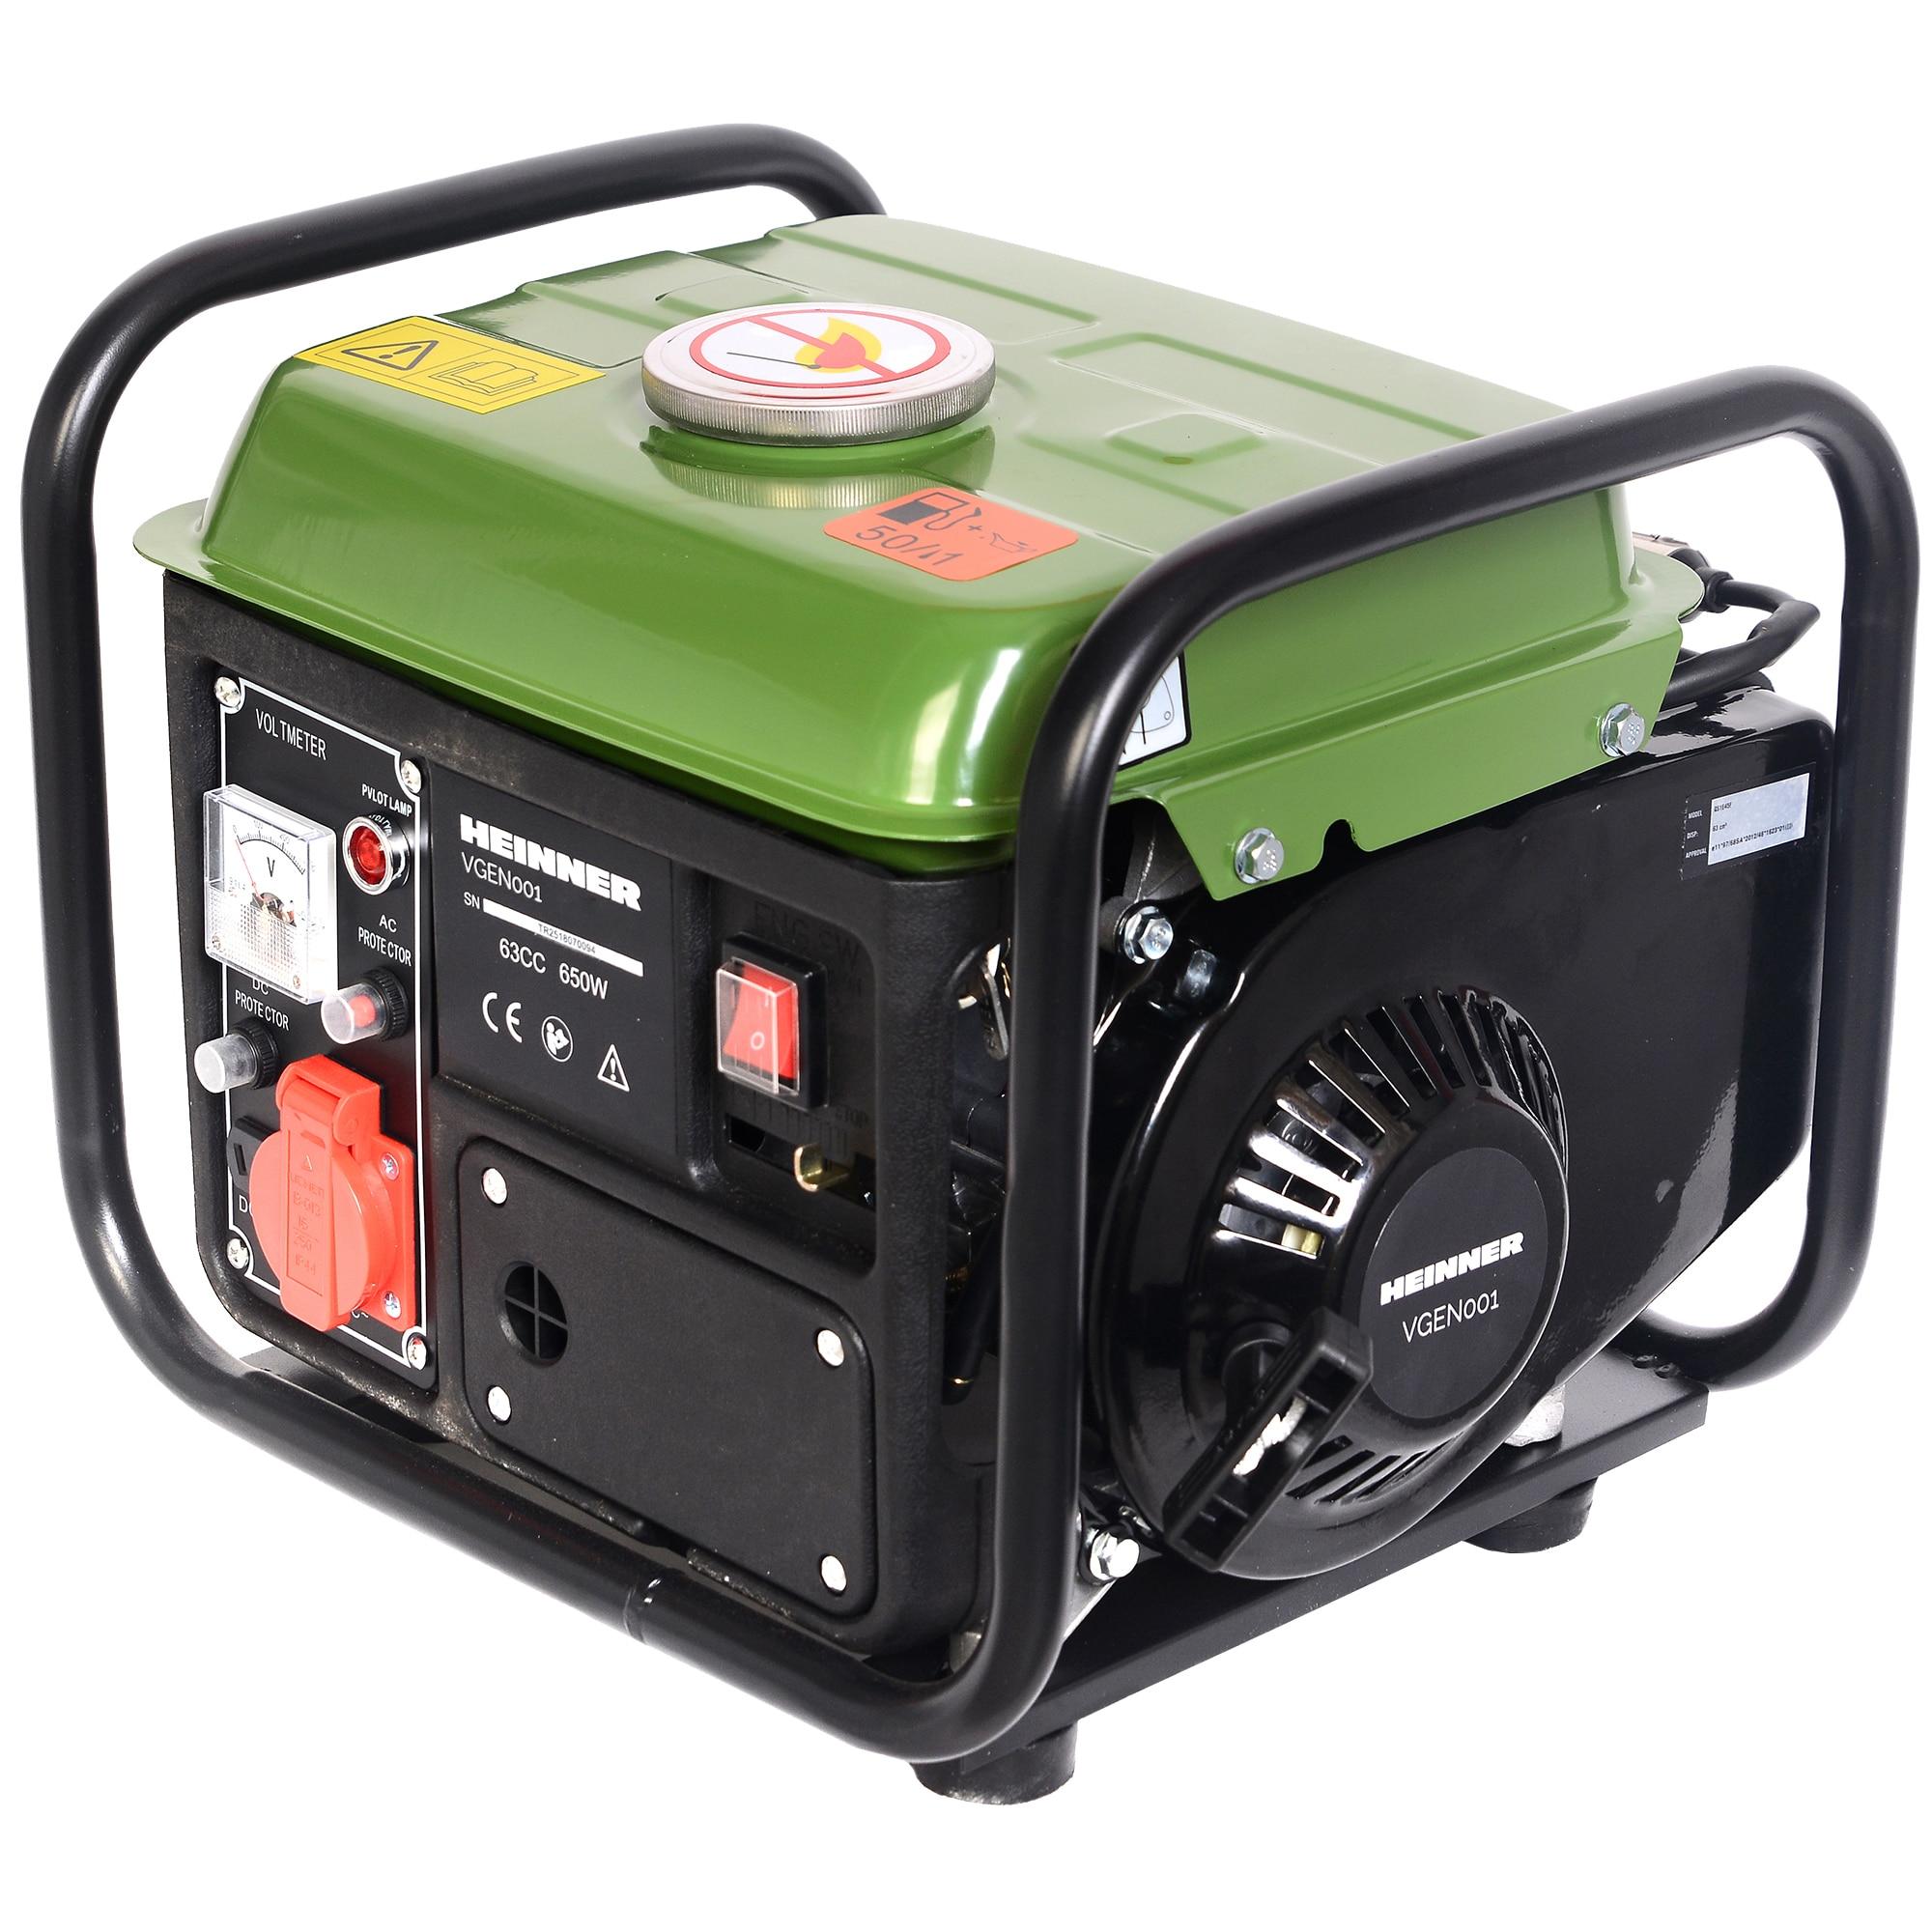 Fotografie Generator Heinner VGEN001, 650 W, 63 CC, 230 V, 2 timpi, 4 l, benzina